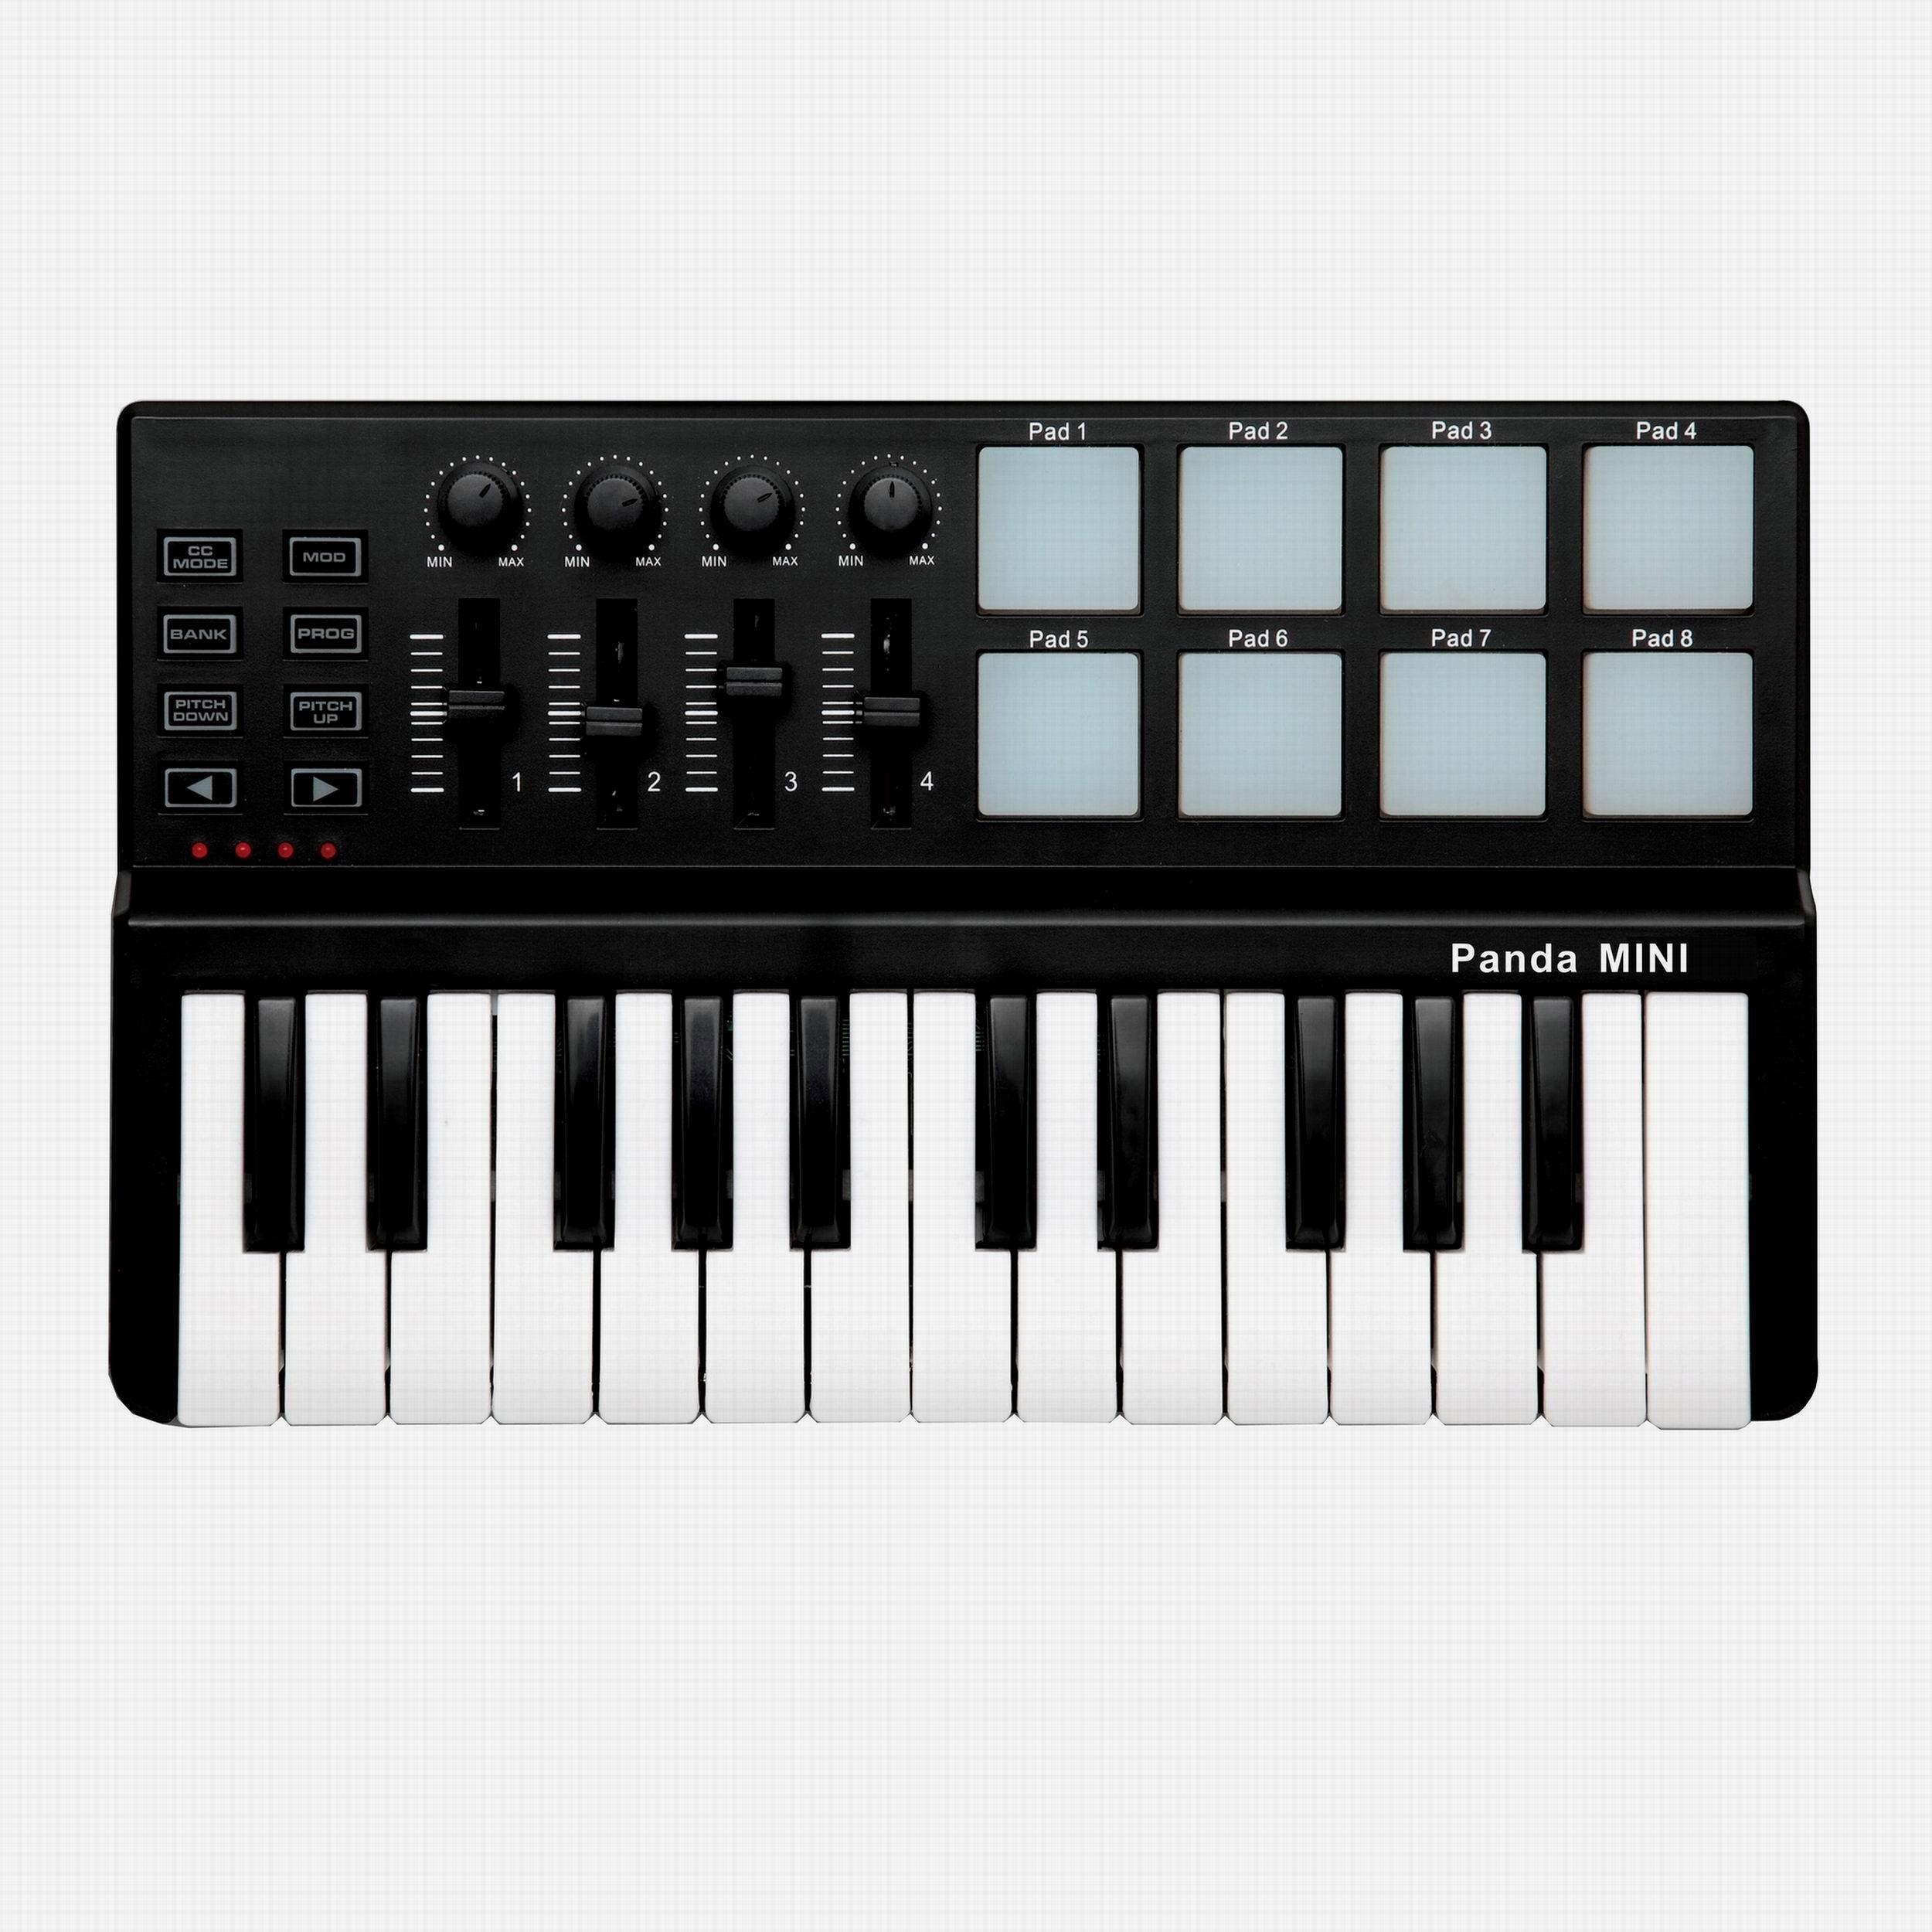 PANDA MINI/MIDI клавиатура / контролер /25/49/61/88 связь / музыка клавиатура / мат